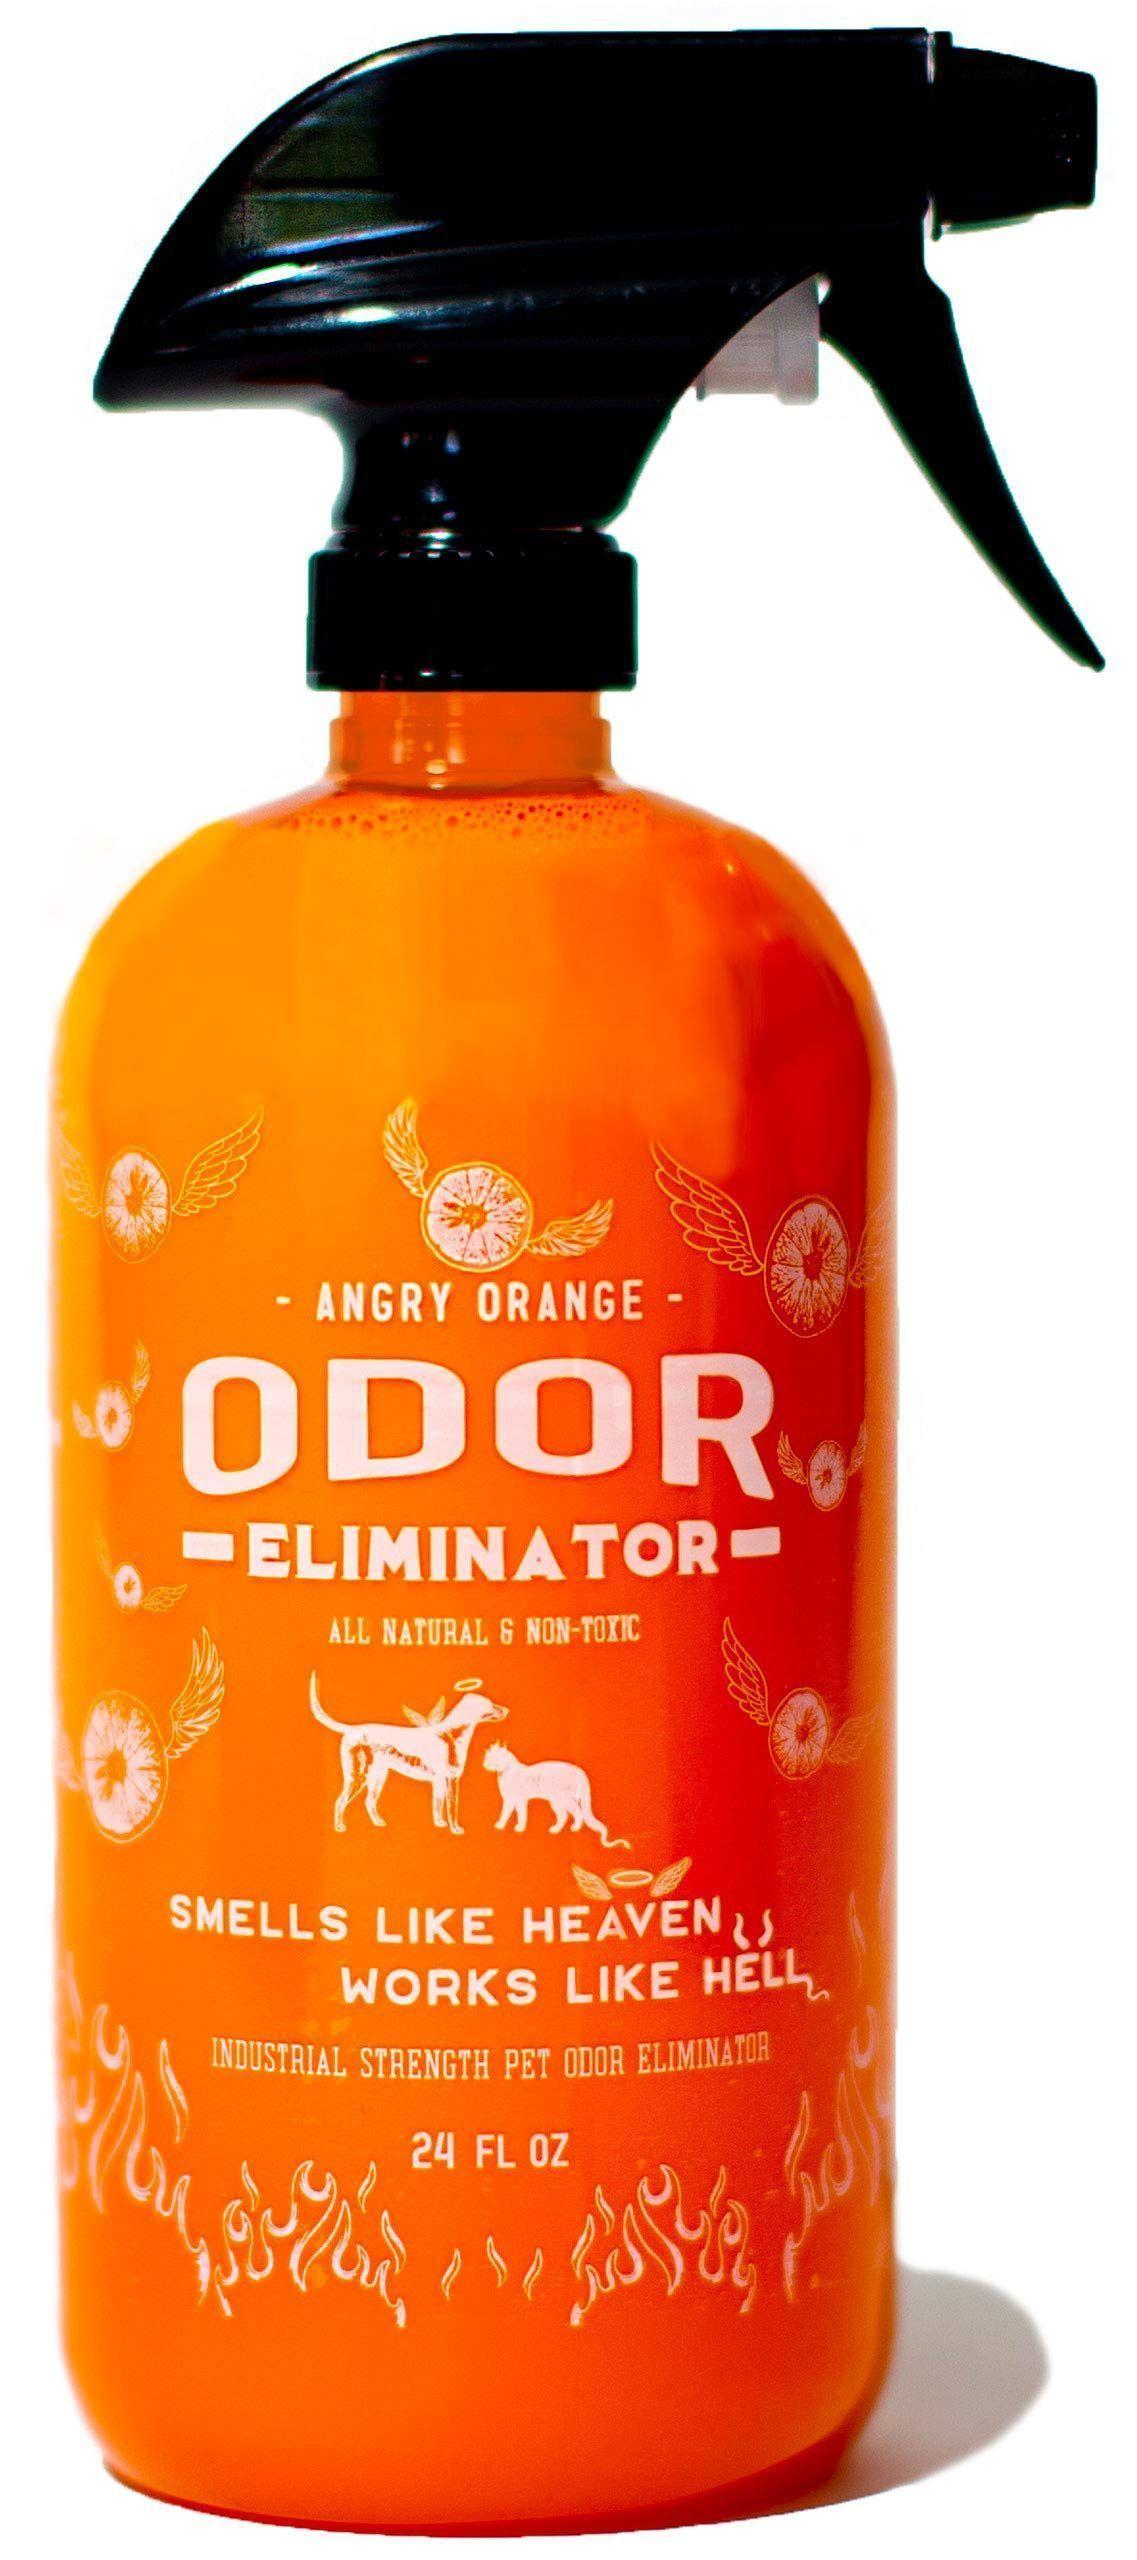 Dog Urine Odor Remover Outdoor Dog Urine Odor Remover In 2020 Dog Urine Odor Remover Pet Spray Pet Odor Eliminator